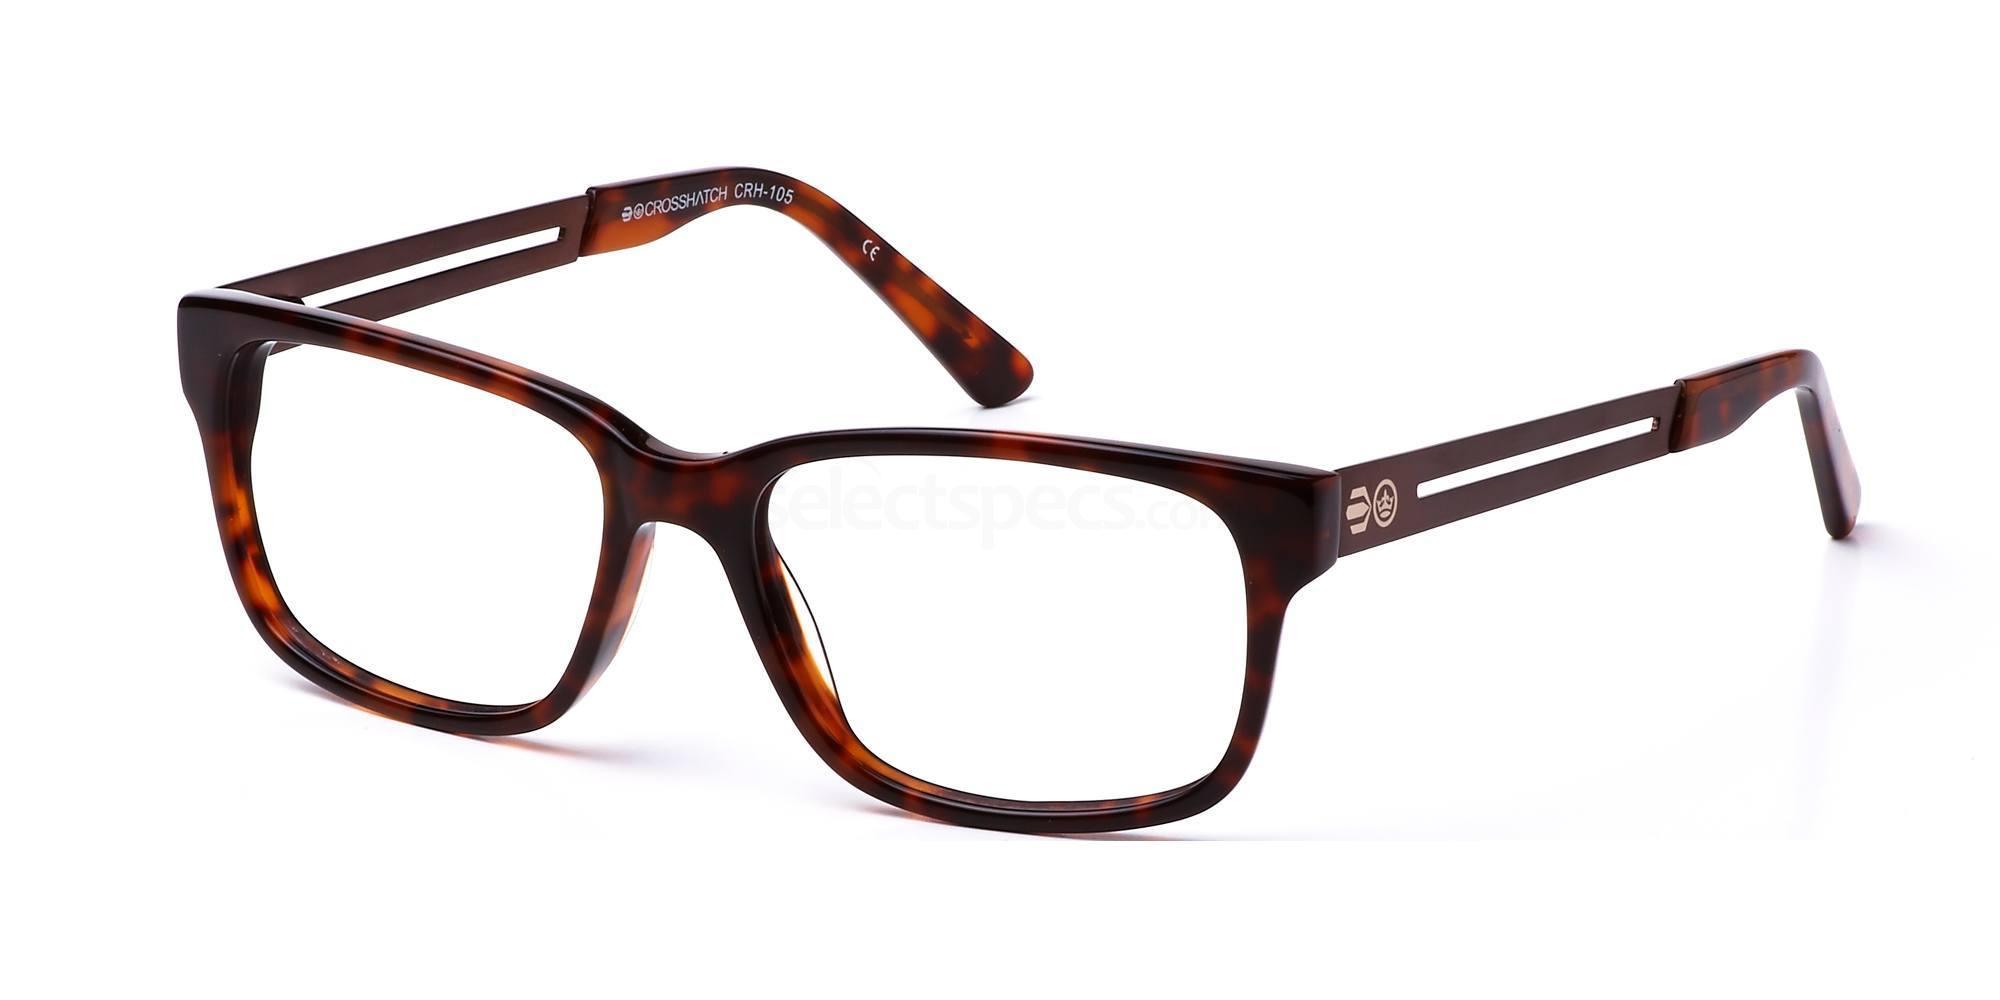 C2 CRH105 Glasses, Crosshatch